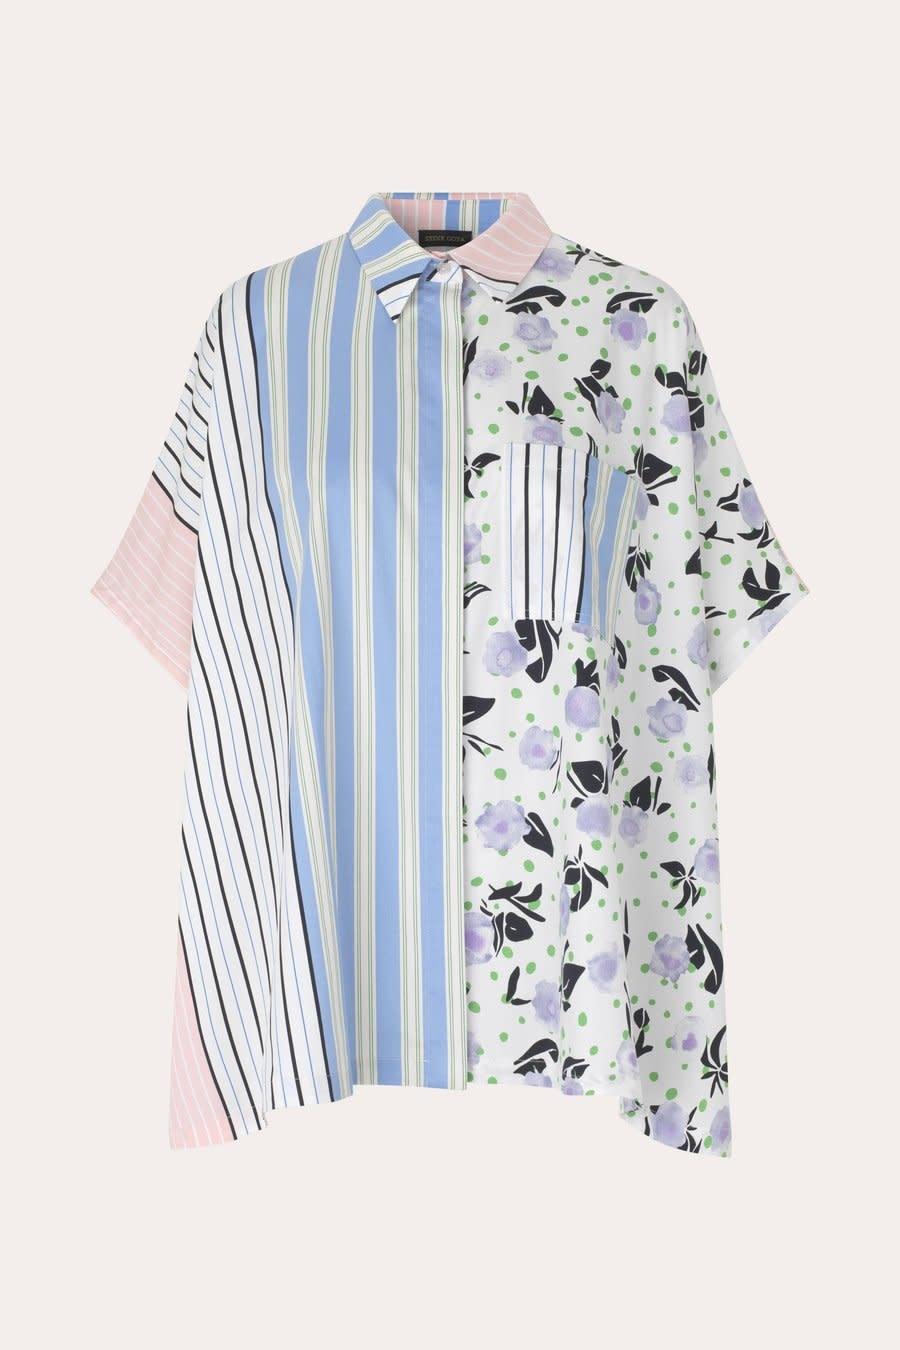 Luna shirt flowermarket-1